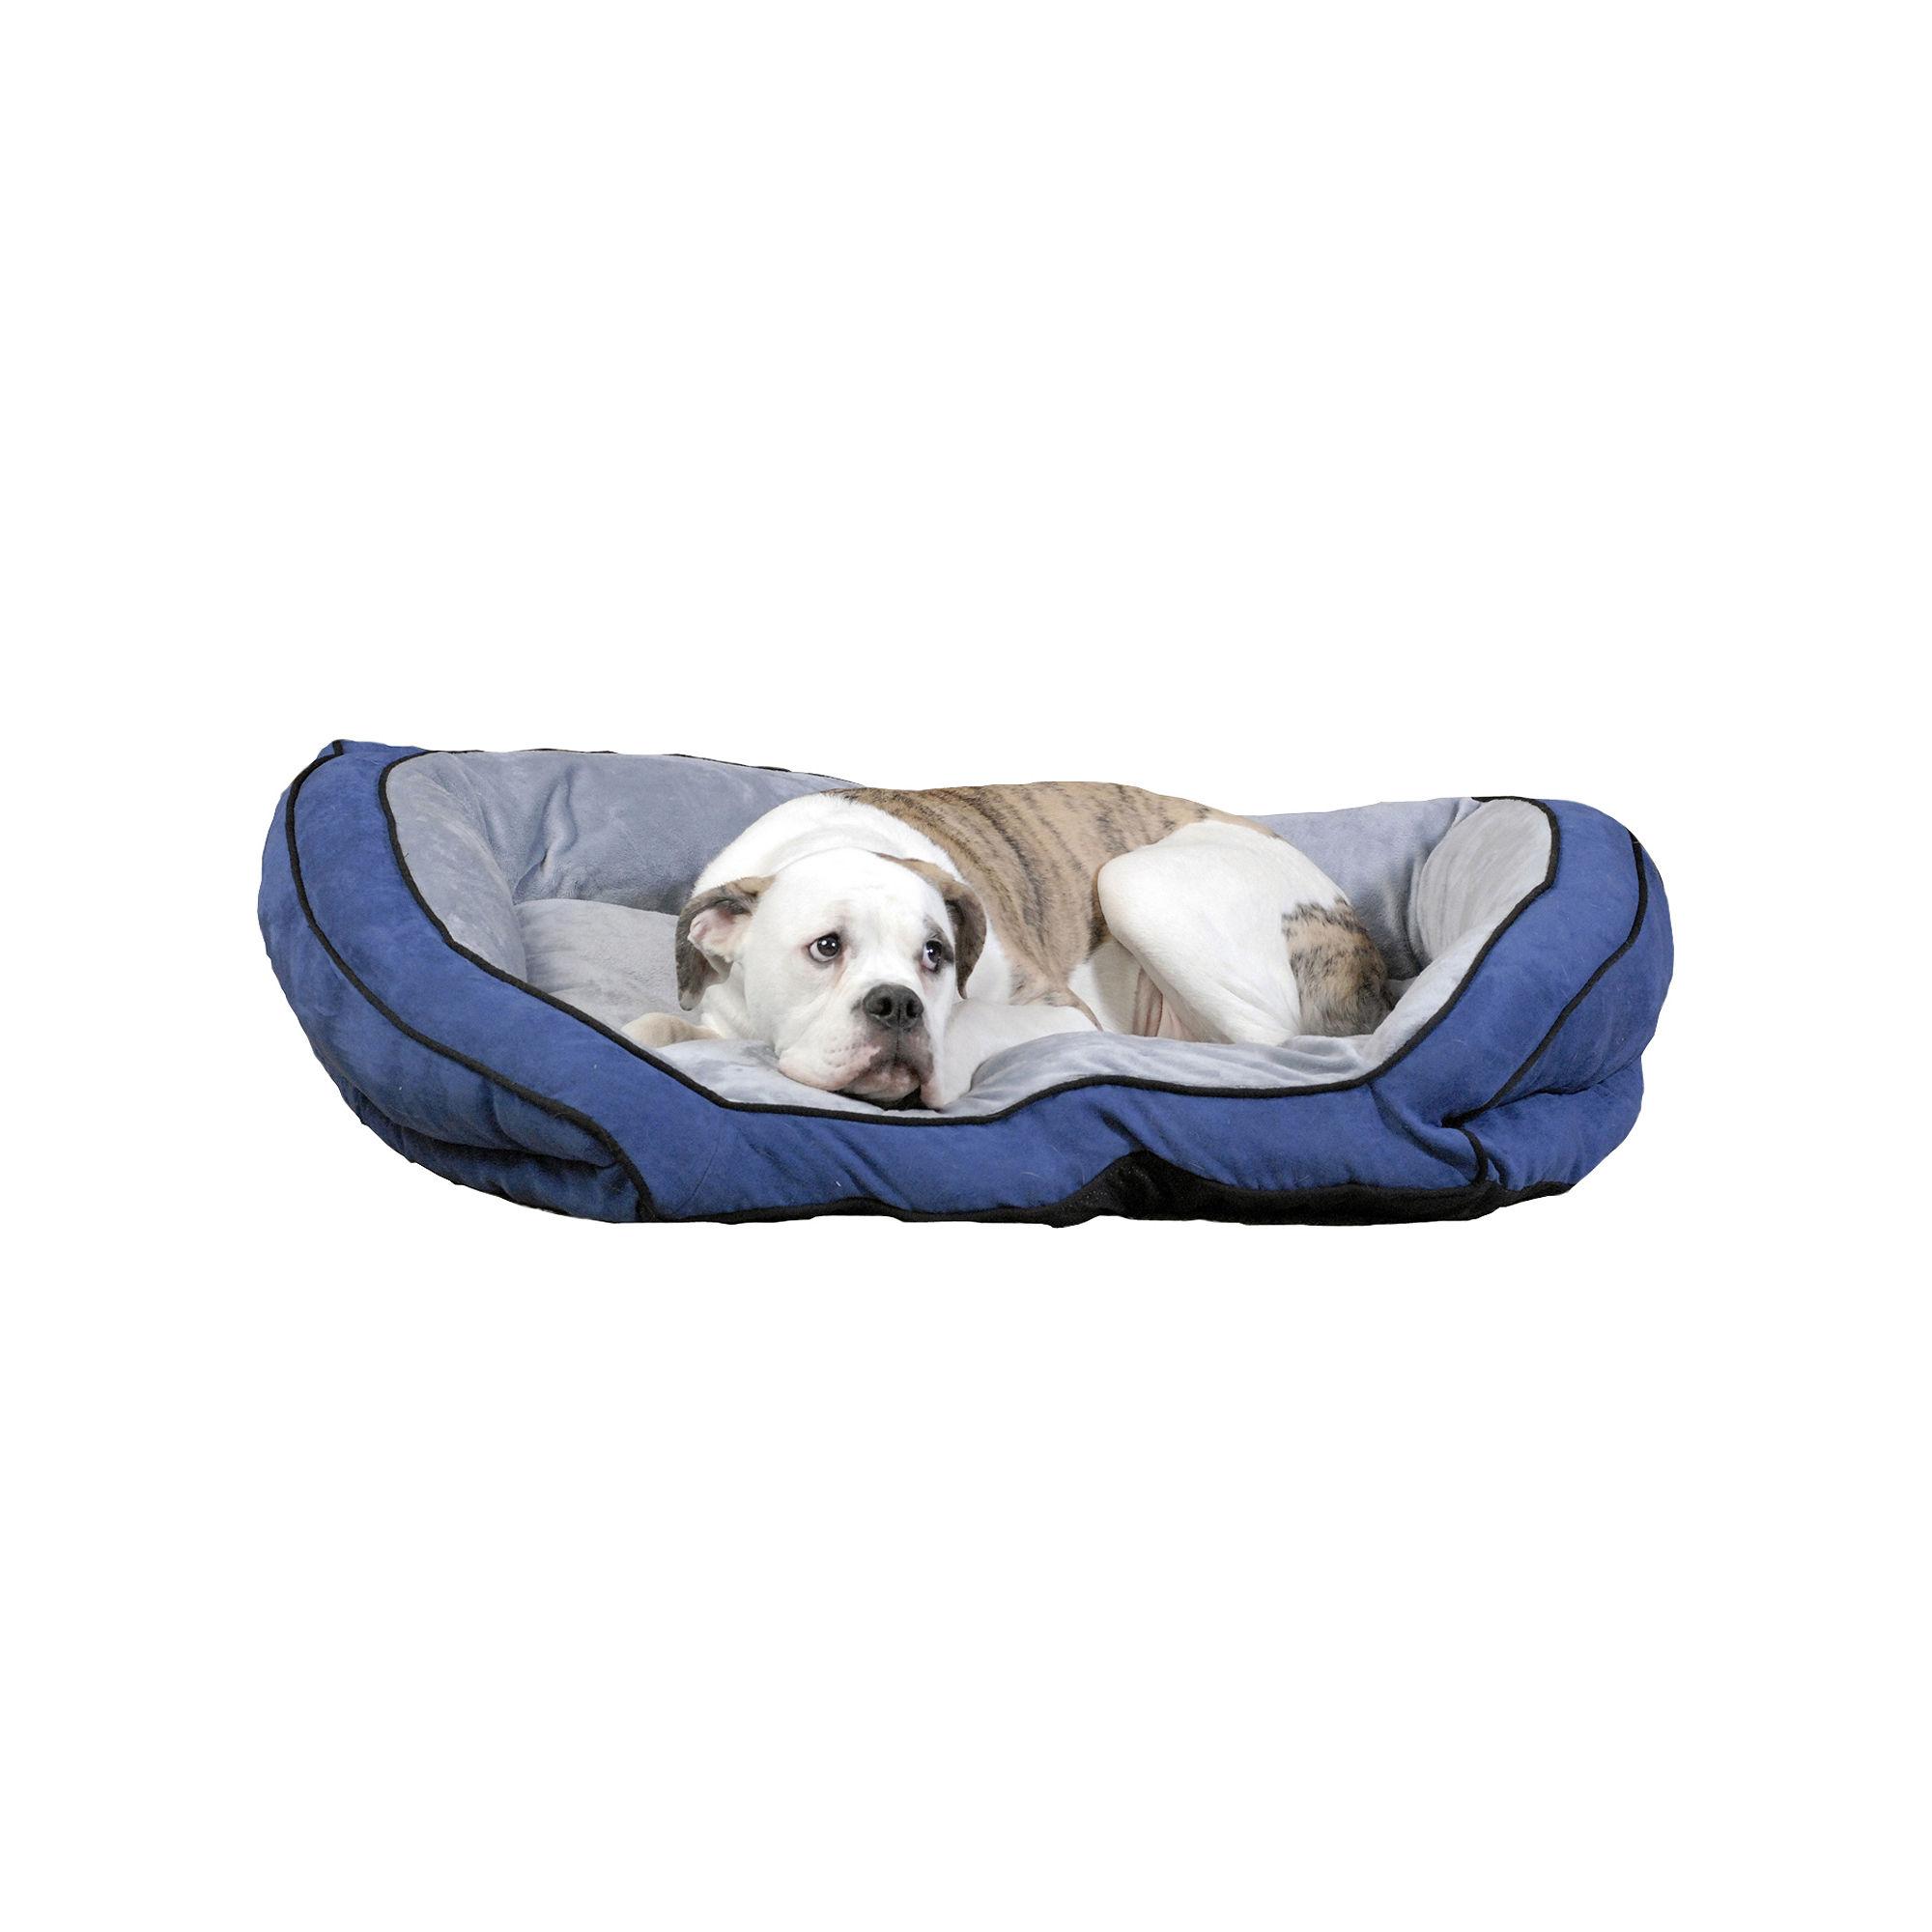 K H Mfg Dog Bed